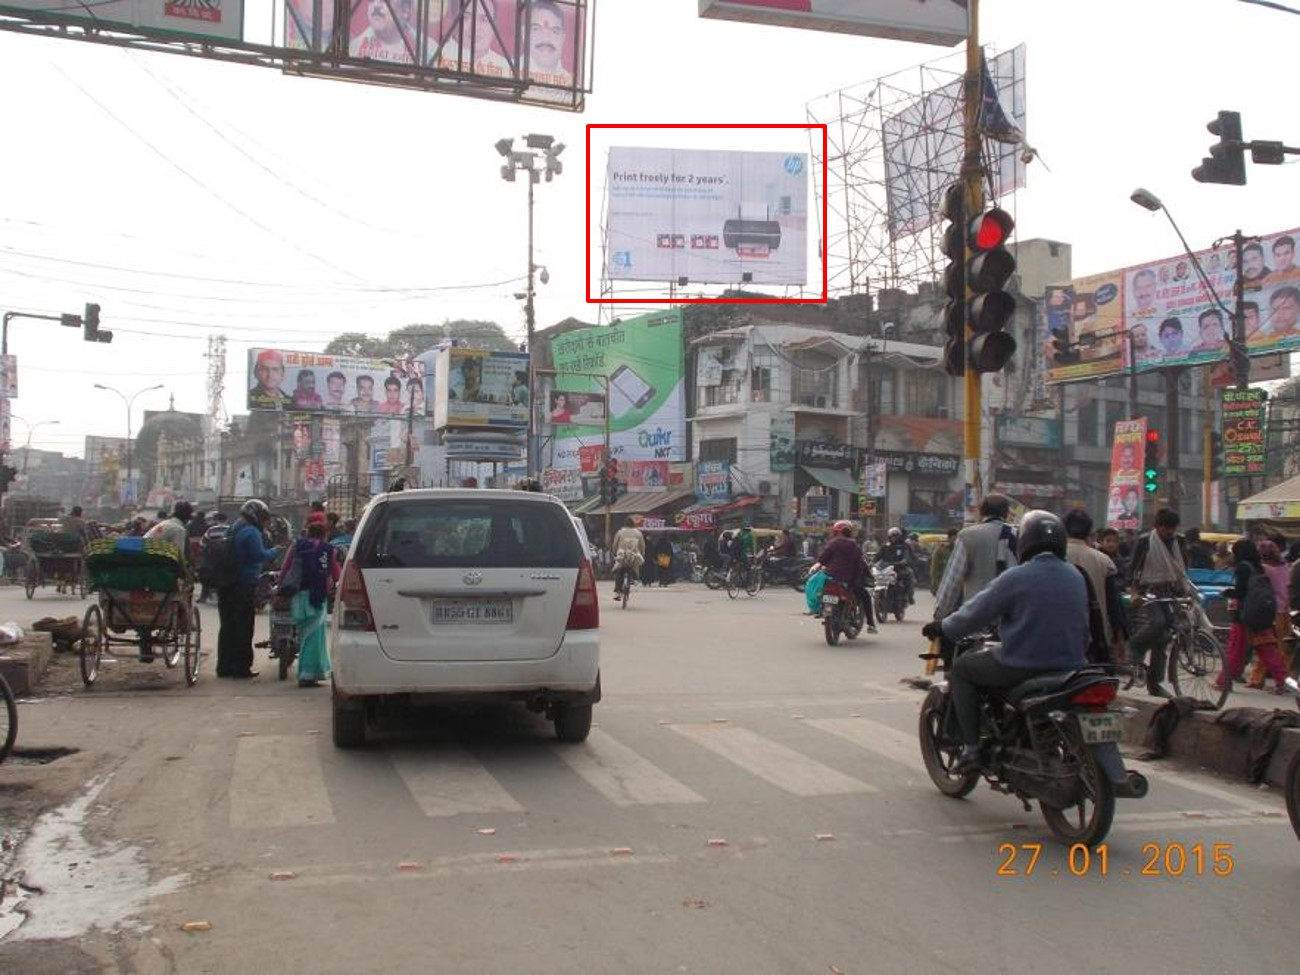 Parade Circle, Kanpur